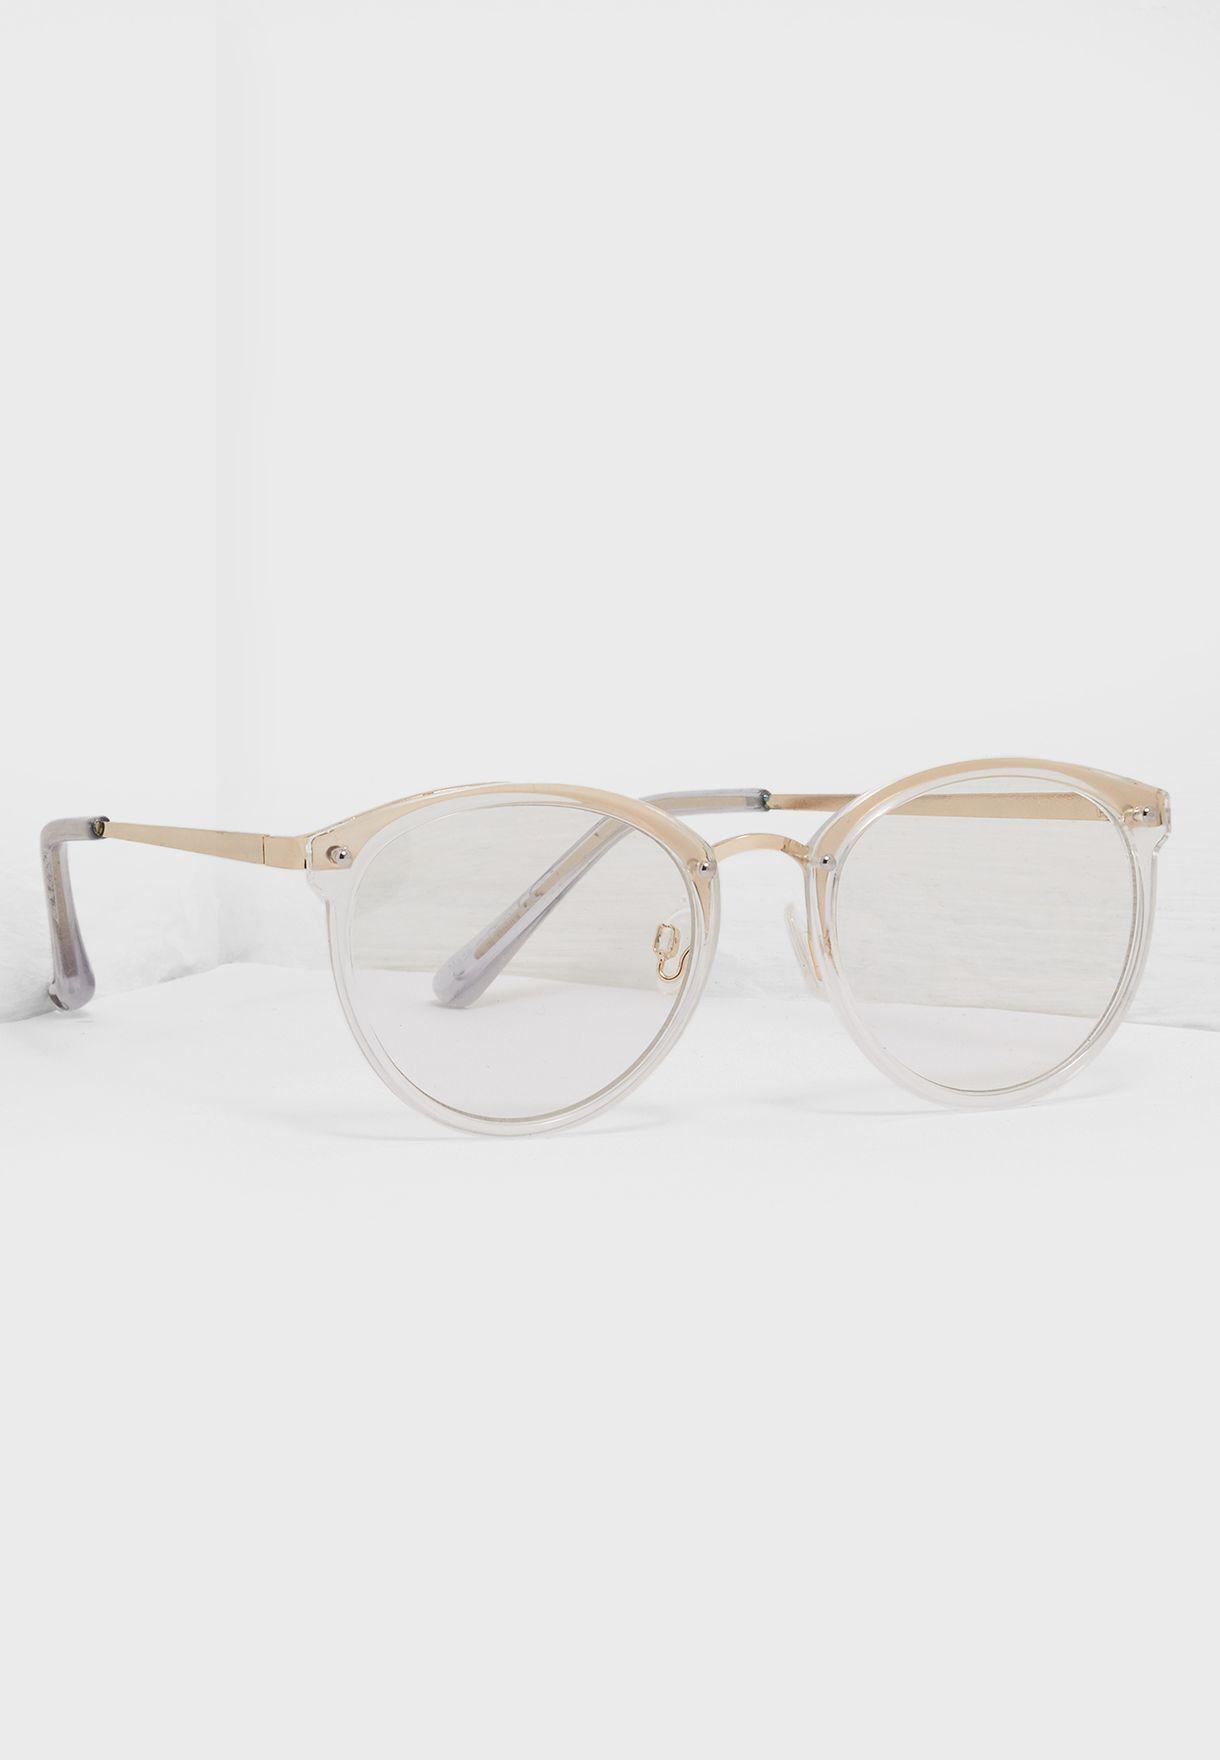 ead0057875 Shop Call It Spring white Gwerrasa Round Frame Sunglass GWERRASA103 ...